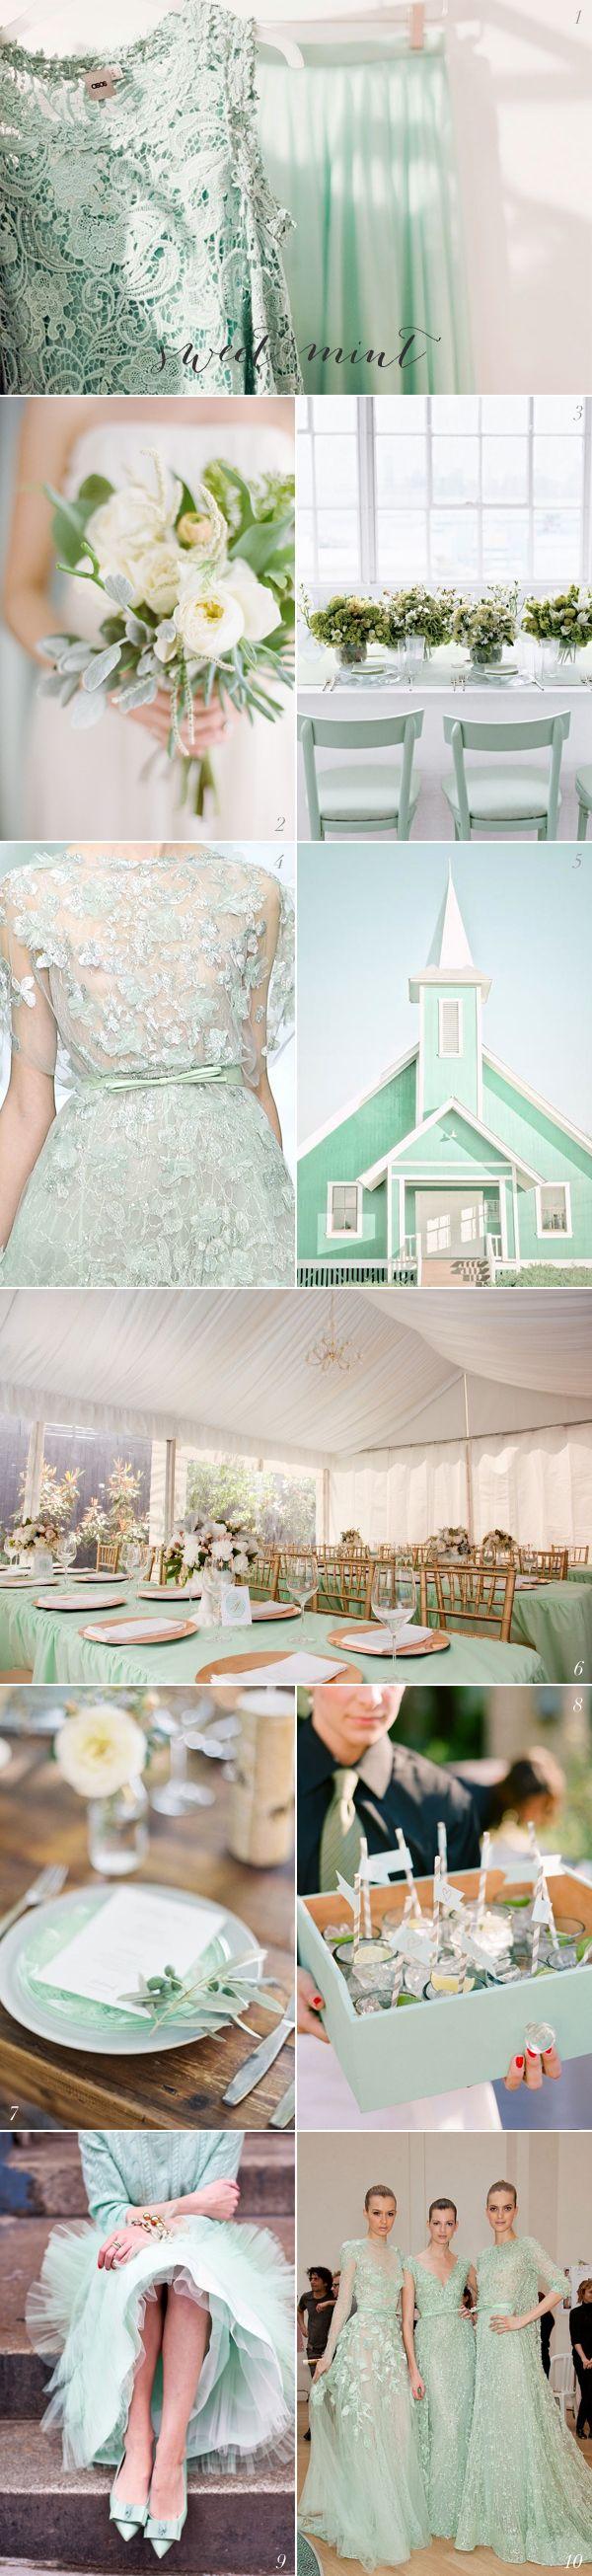 Mint wedding chapel & reception ideas #Mint / pastel green Wedding Reception ... Wedding ideas for brides, grooms, parents & planners ... https://itunes.apple.com/us/app/the-gold-wedding-planner/id498112599?ls=1=8 … plus how to organise an entire wedding ♥ The Gold Wedding Planner iPhone App ♥